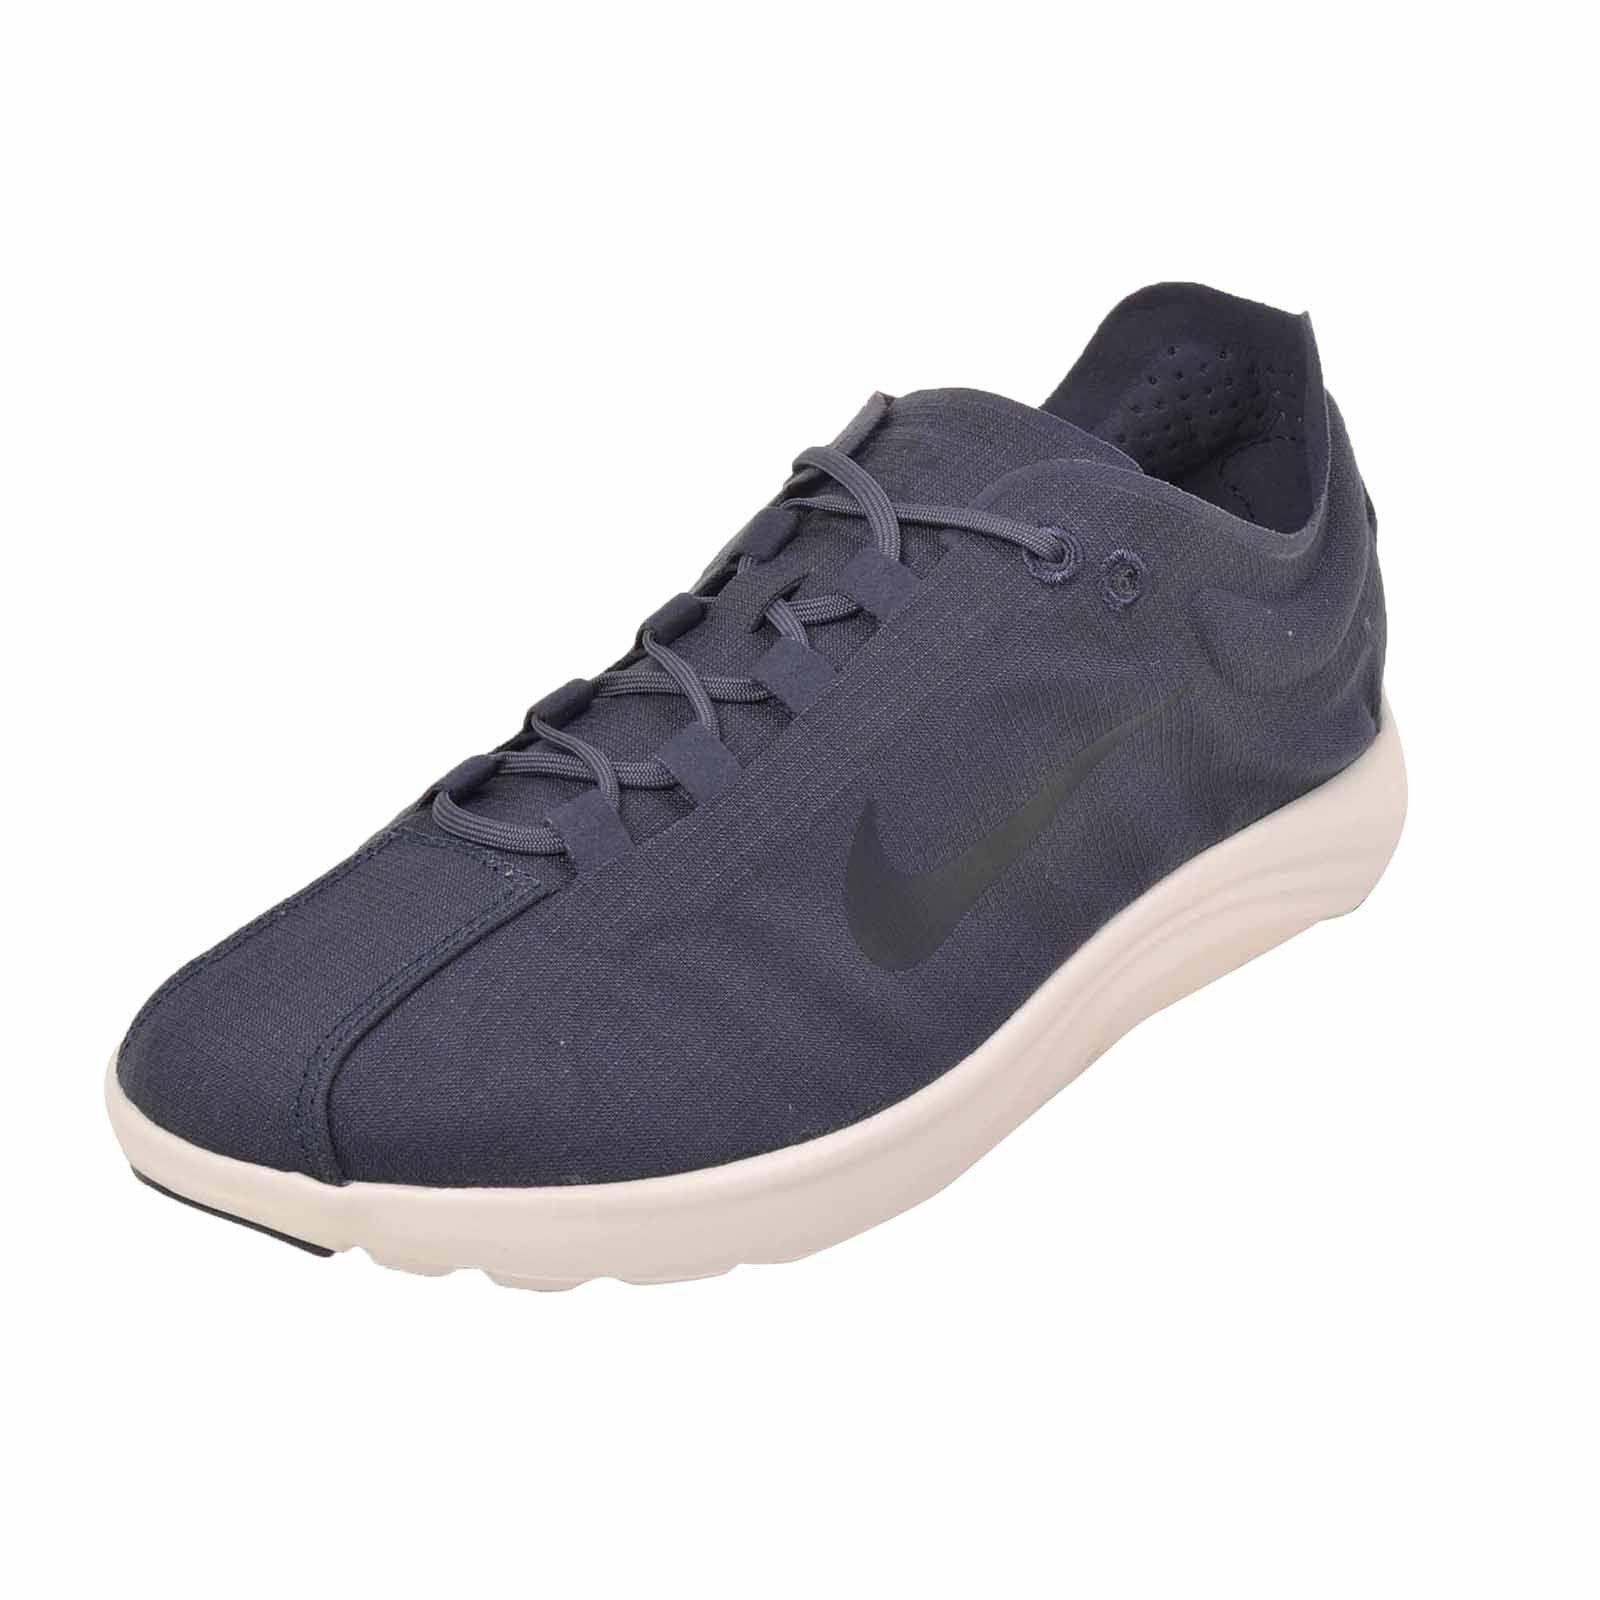 Nike Mayfly Lite Pinnacle Women's Running Training Shoes Thunder Blue 881197 400